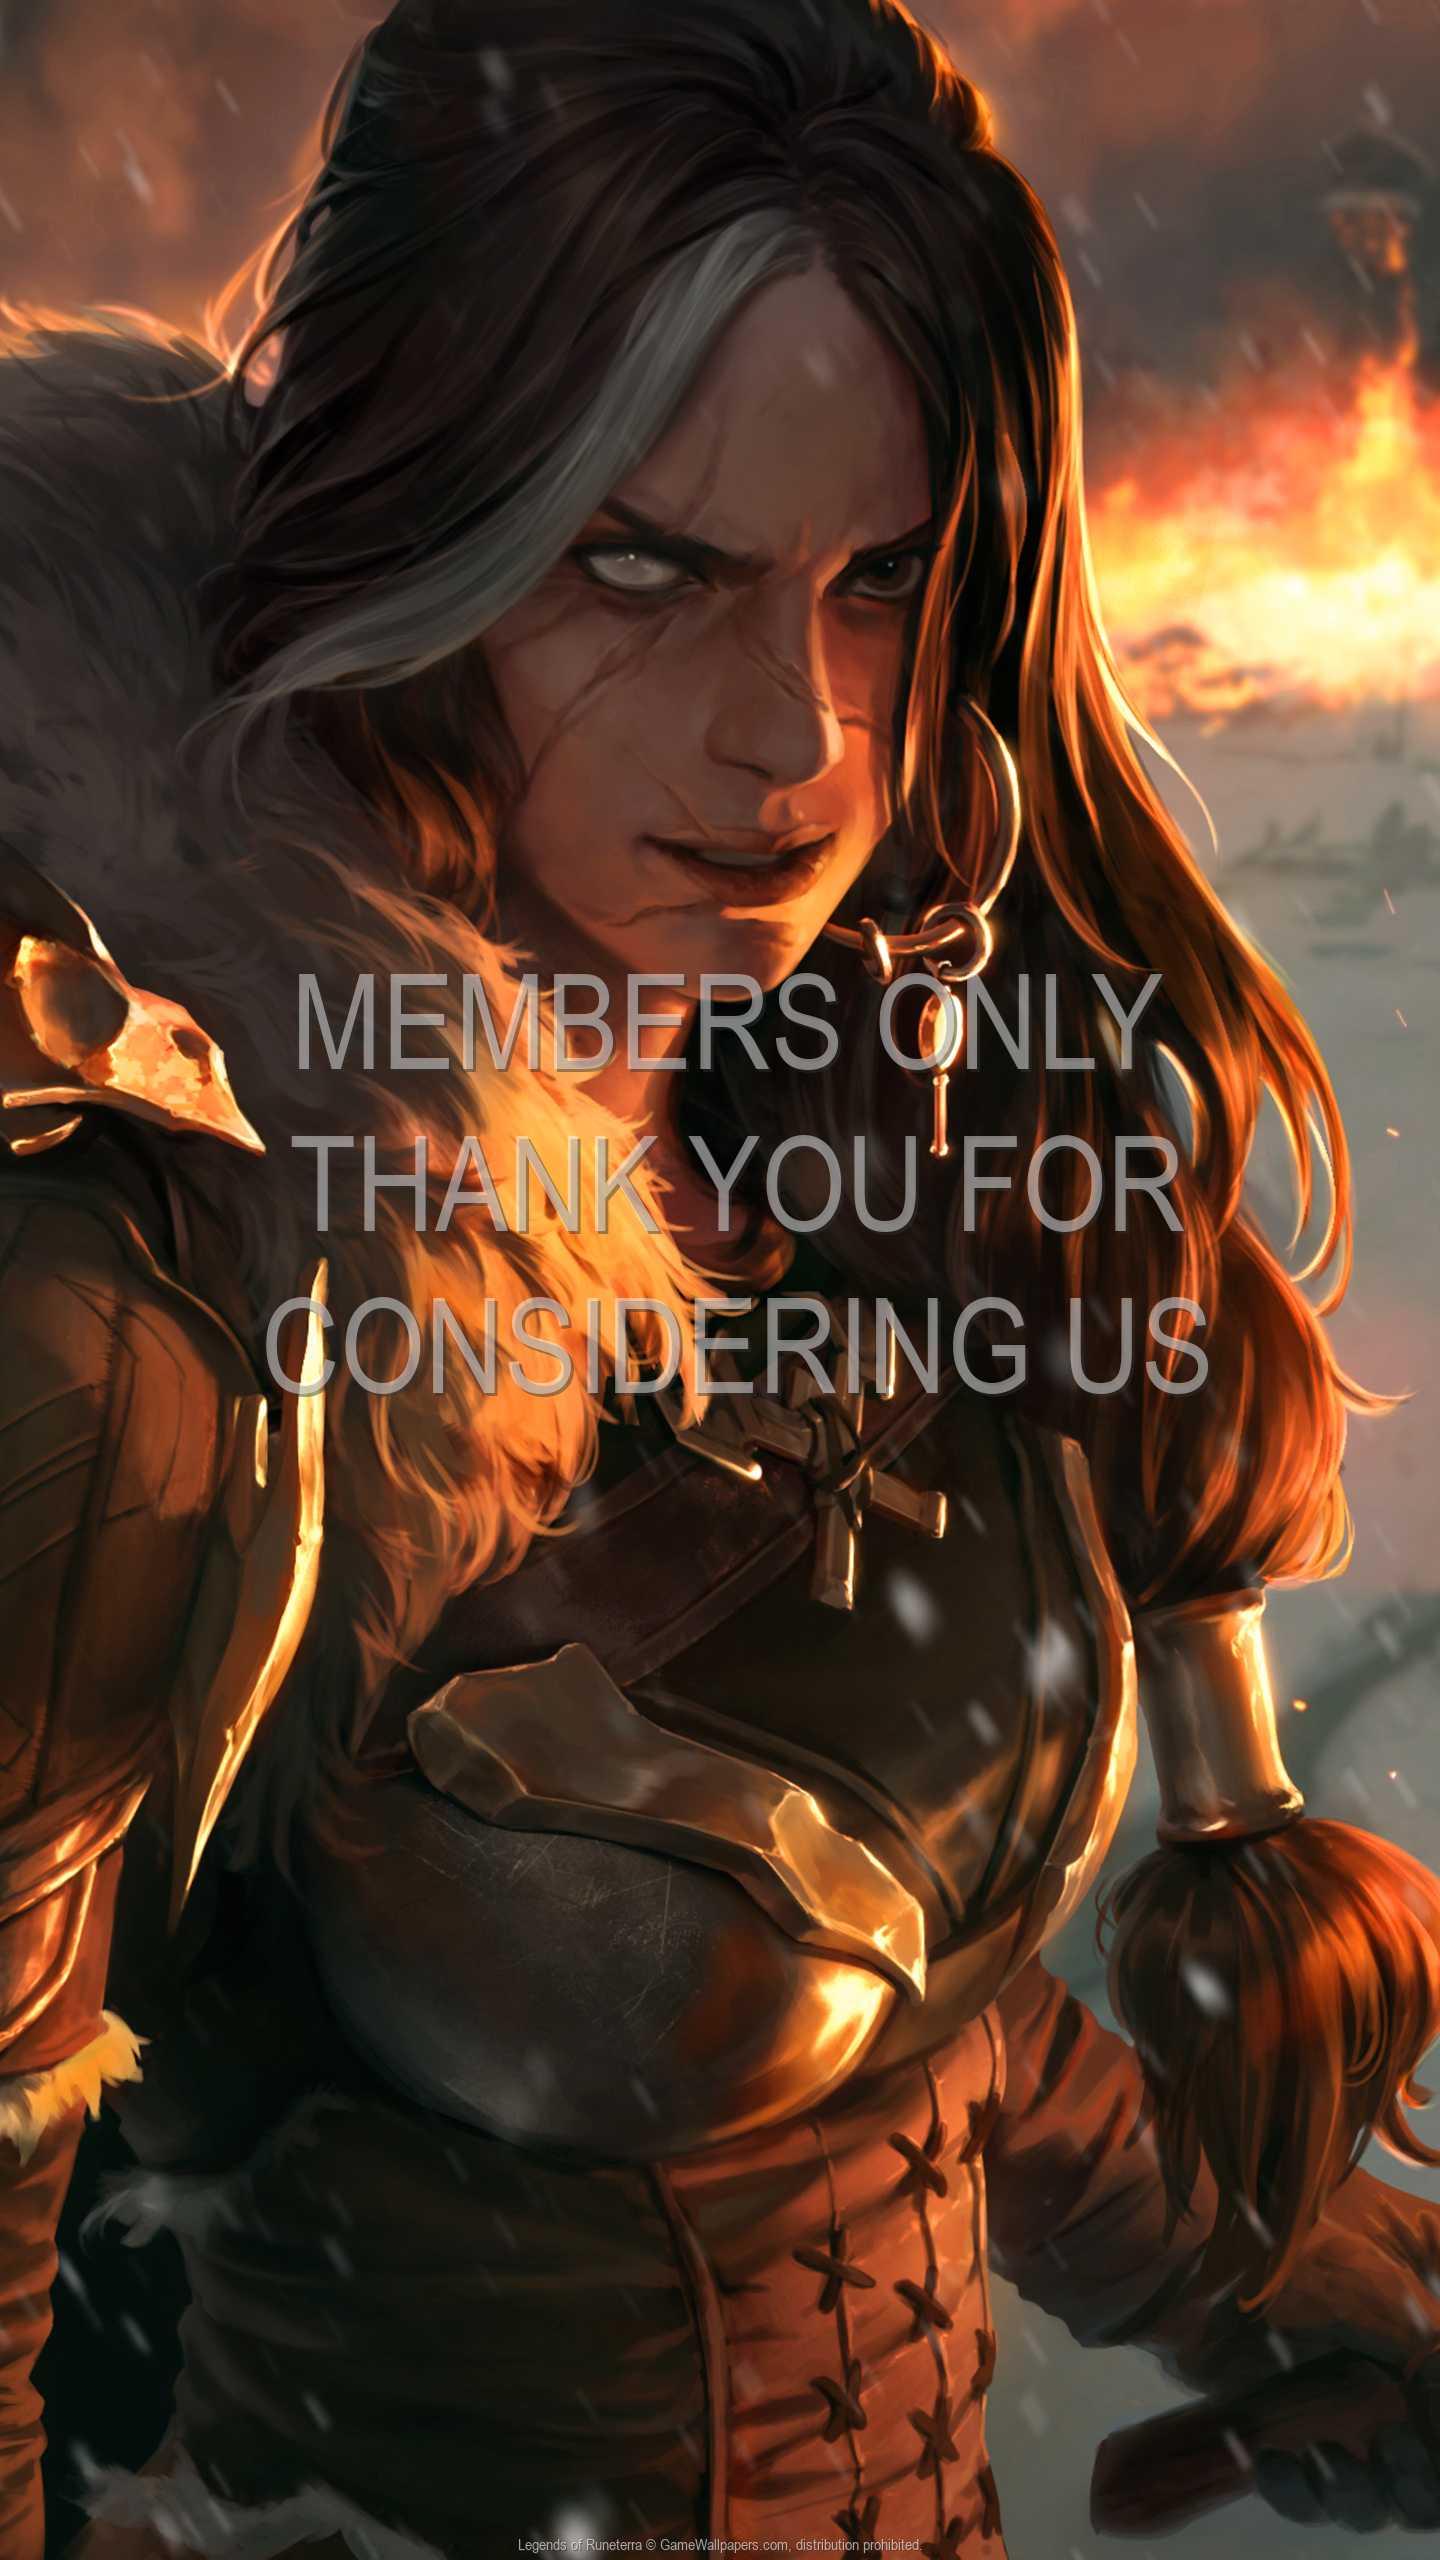 Legends of Runeterra 1440p Vertical Handy Hintergrundbild 01